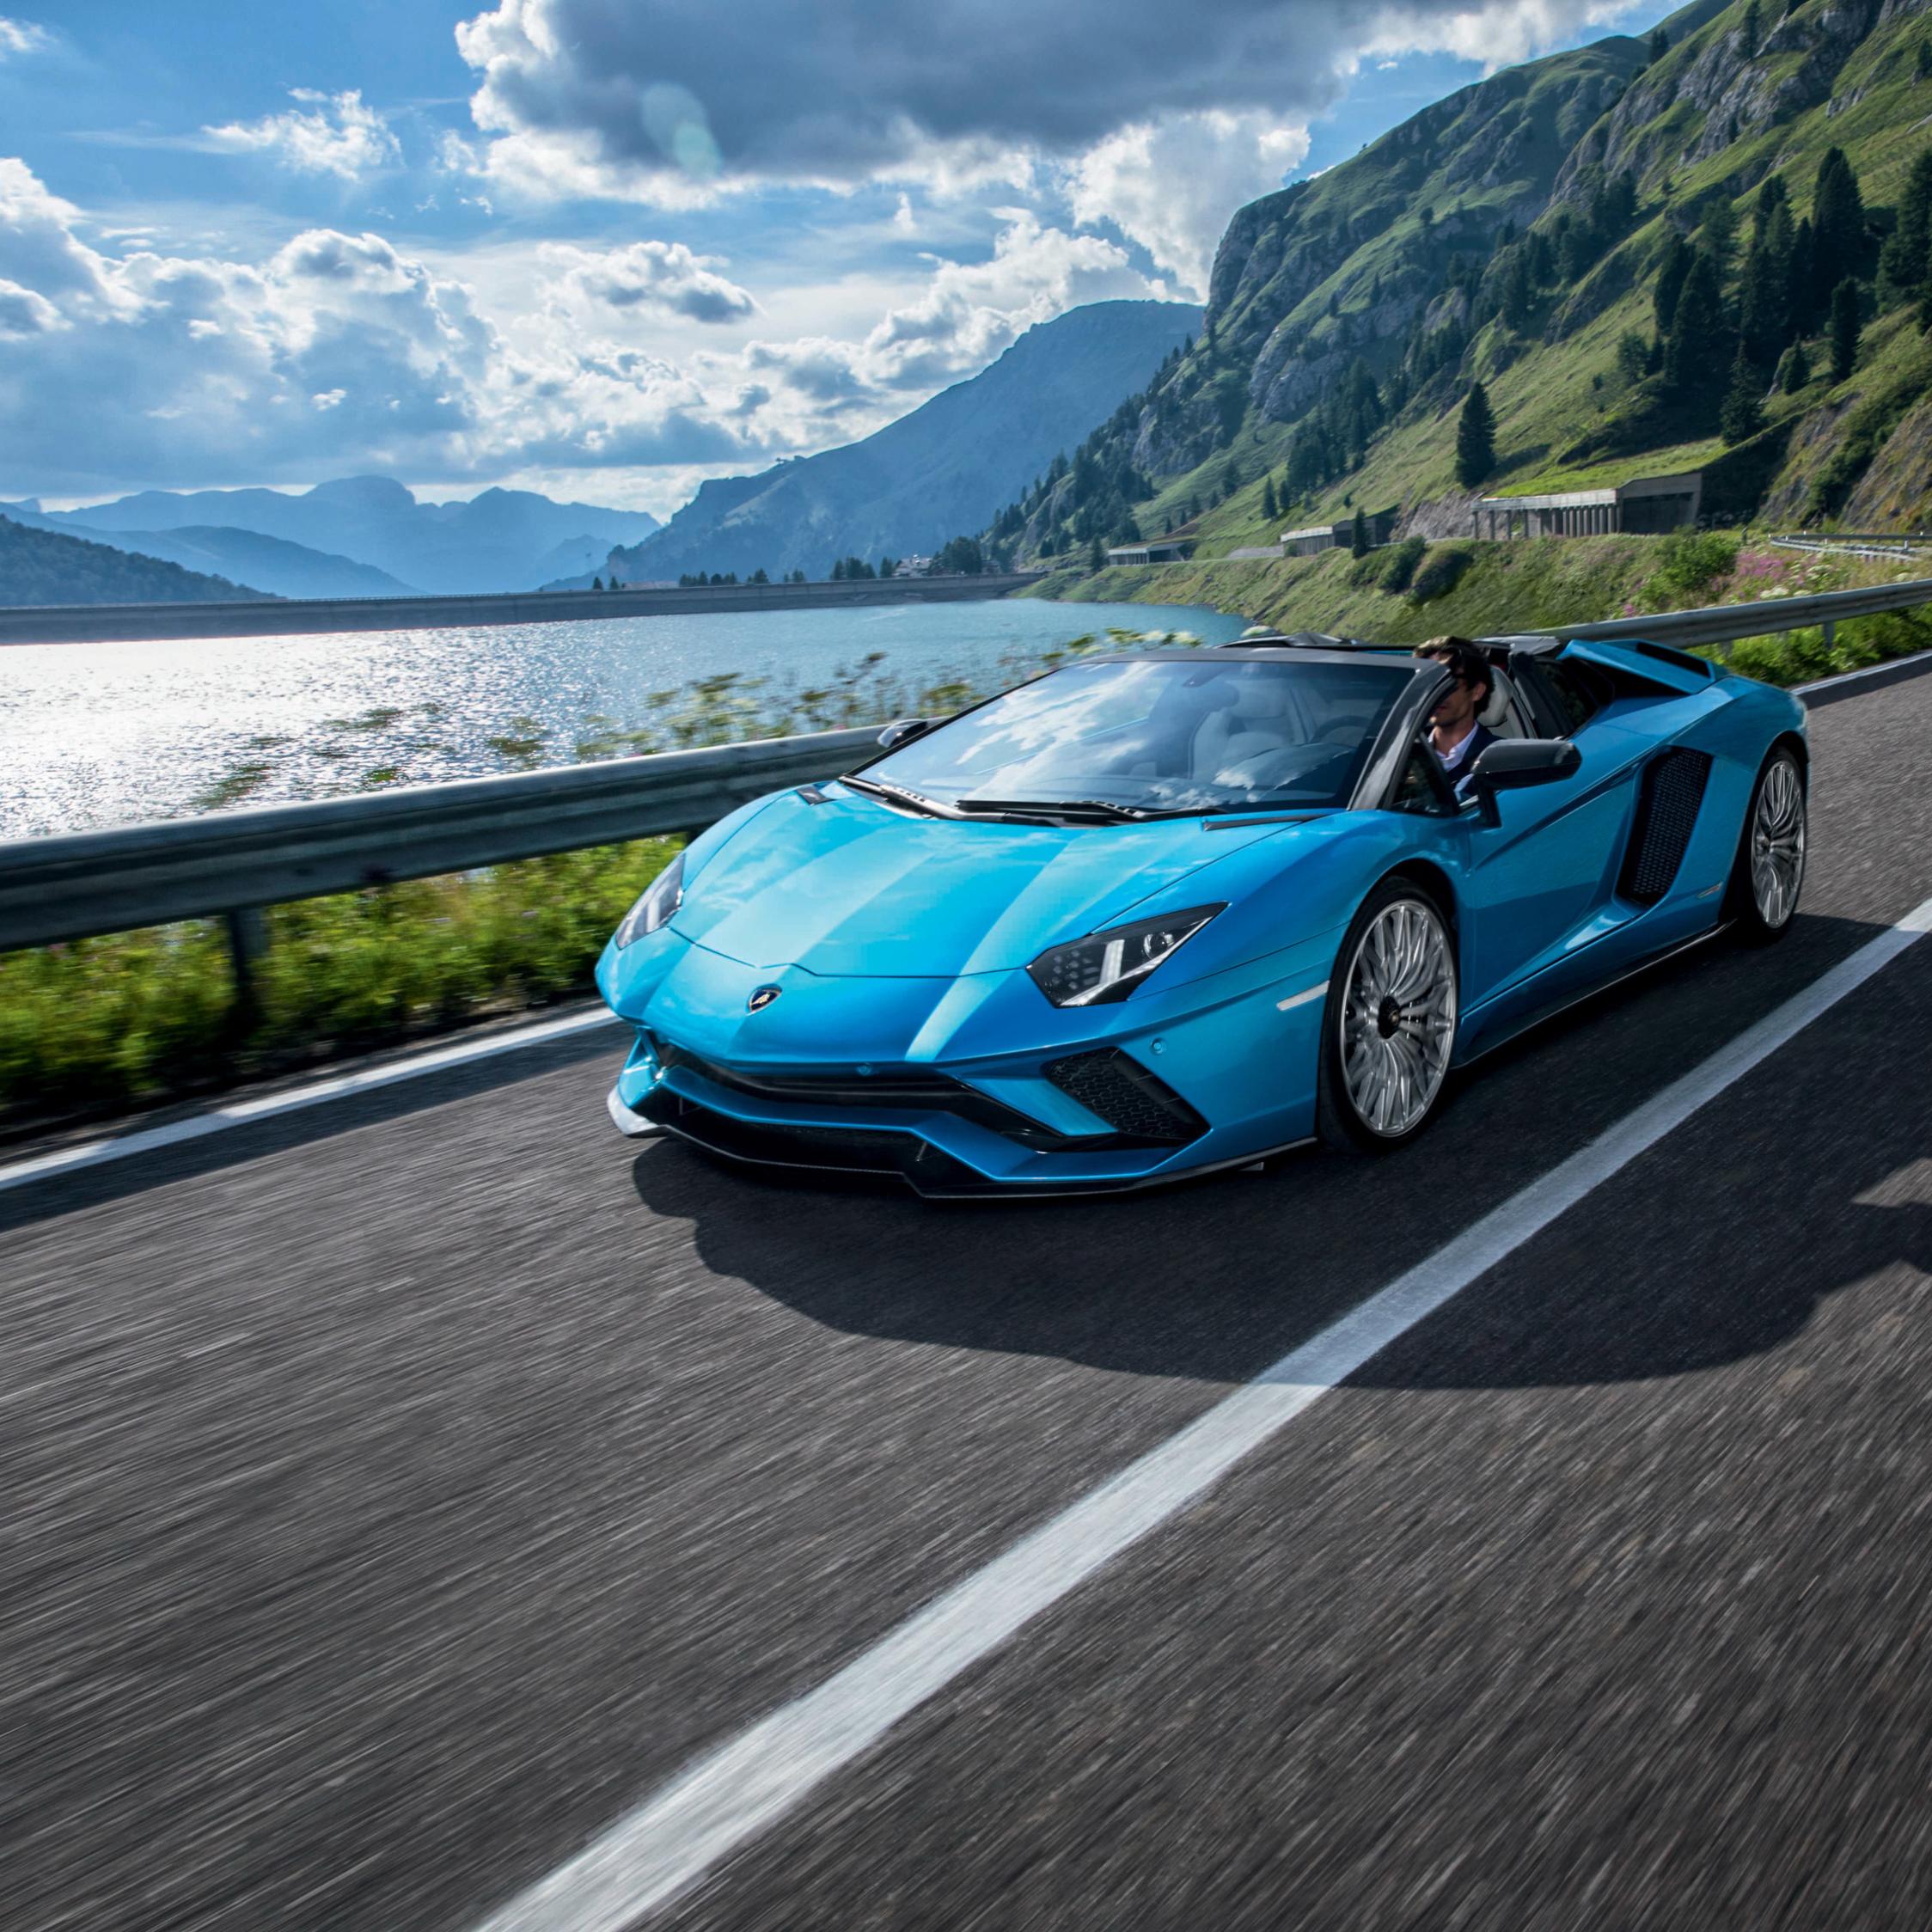 Lamborghini Walpaper: Lamborghini Aventador S Roadster, HD 4K Wallpaper